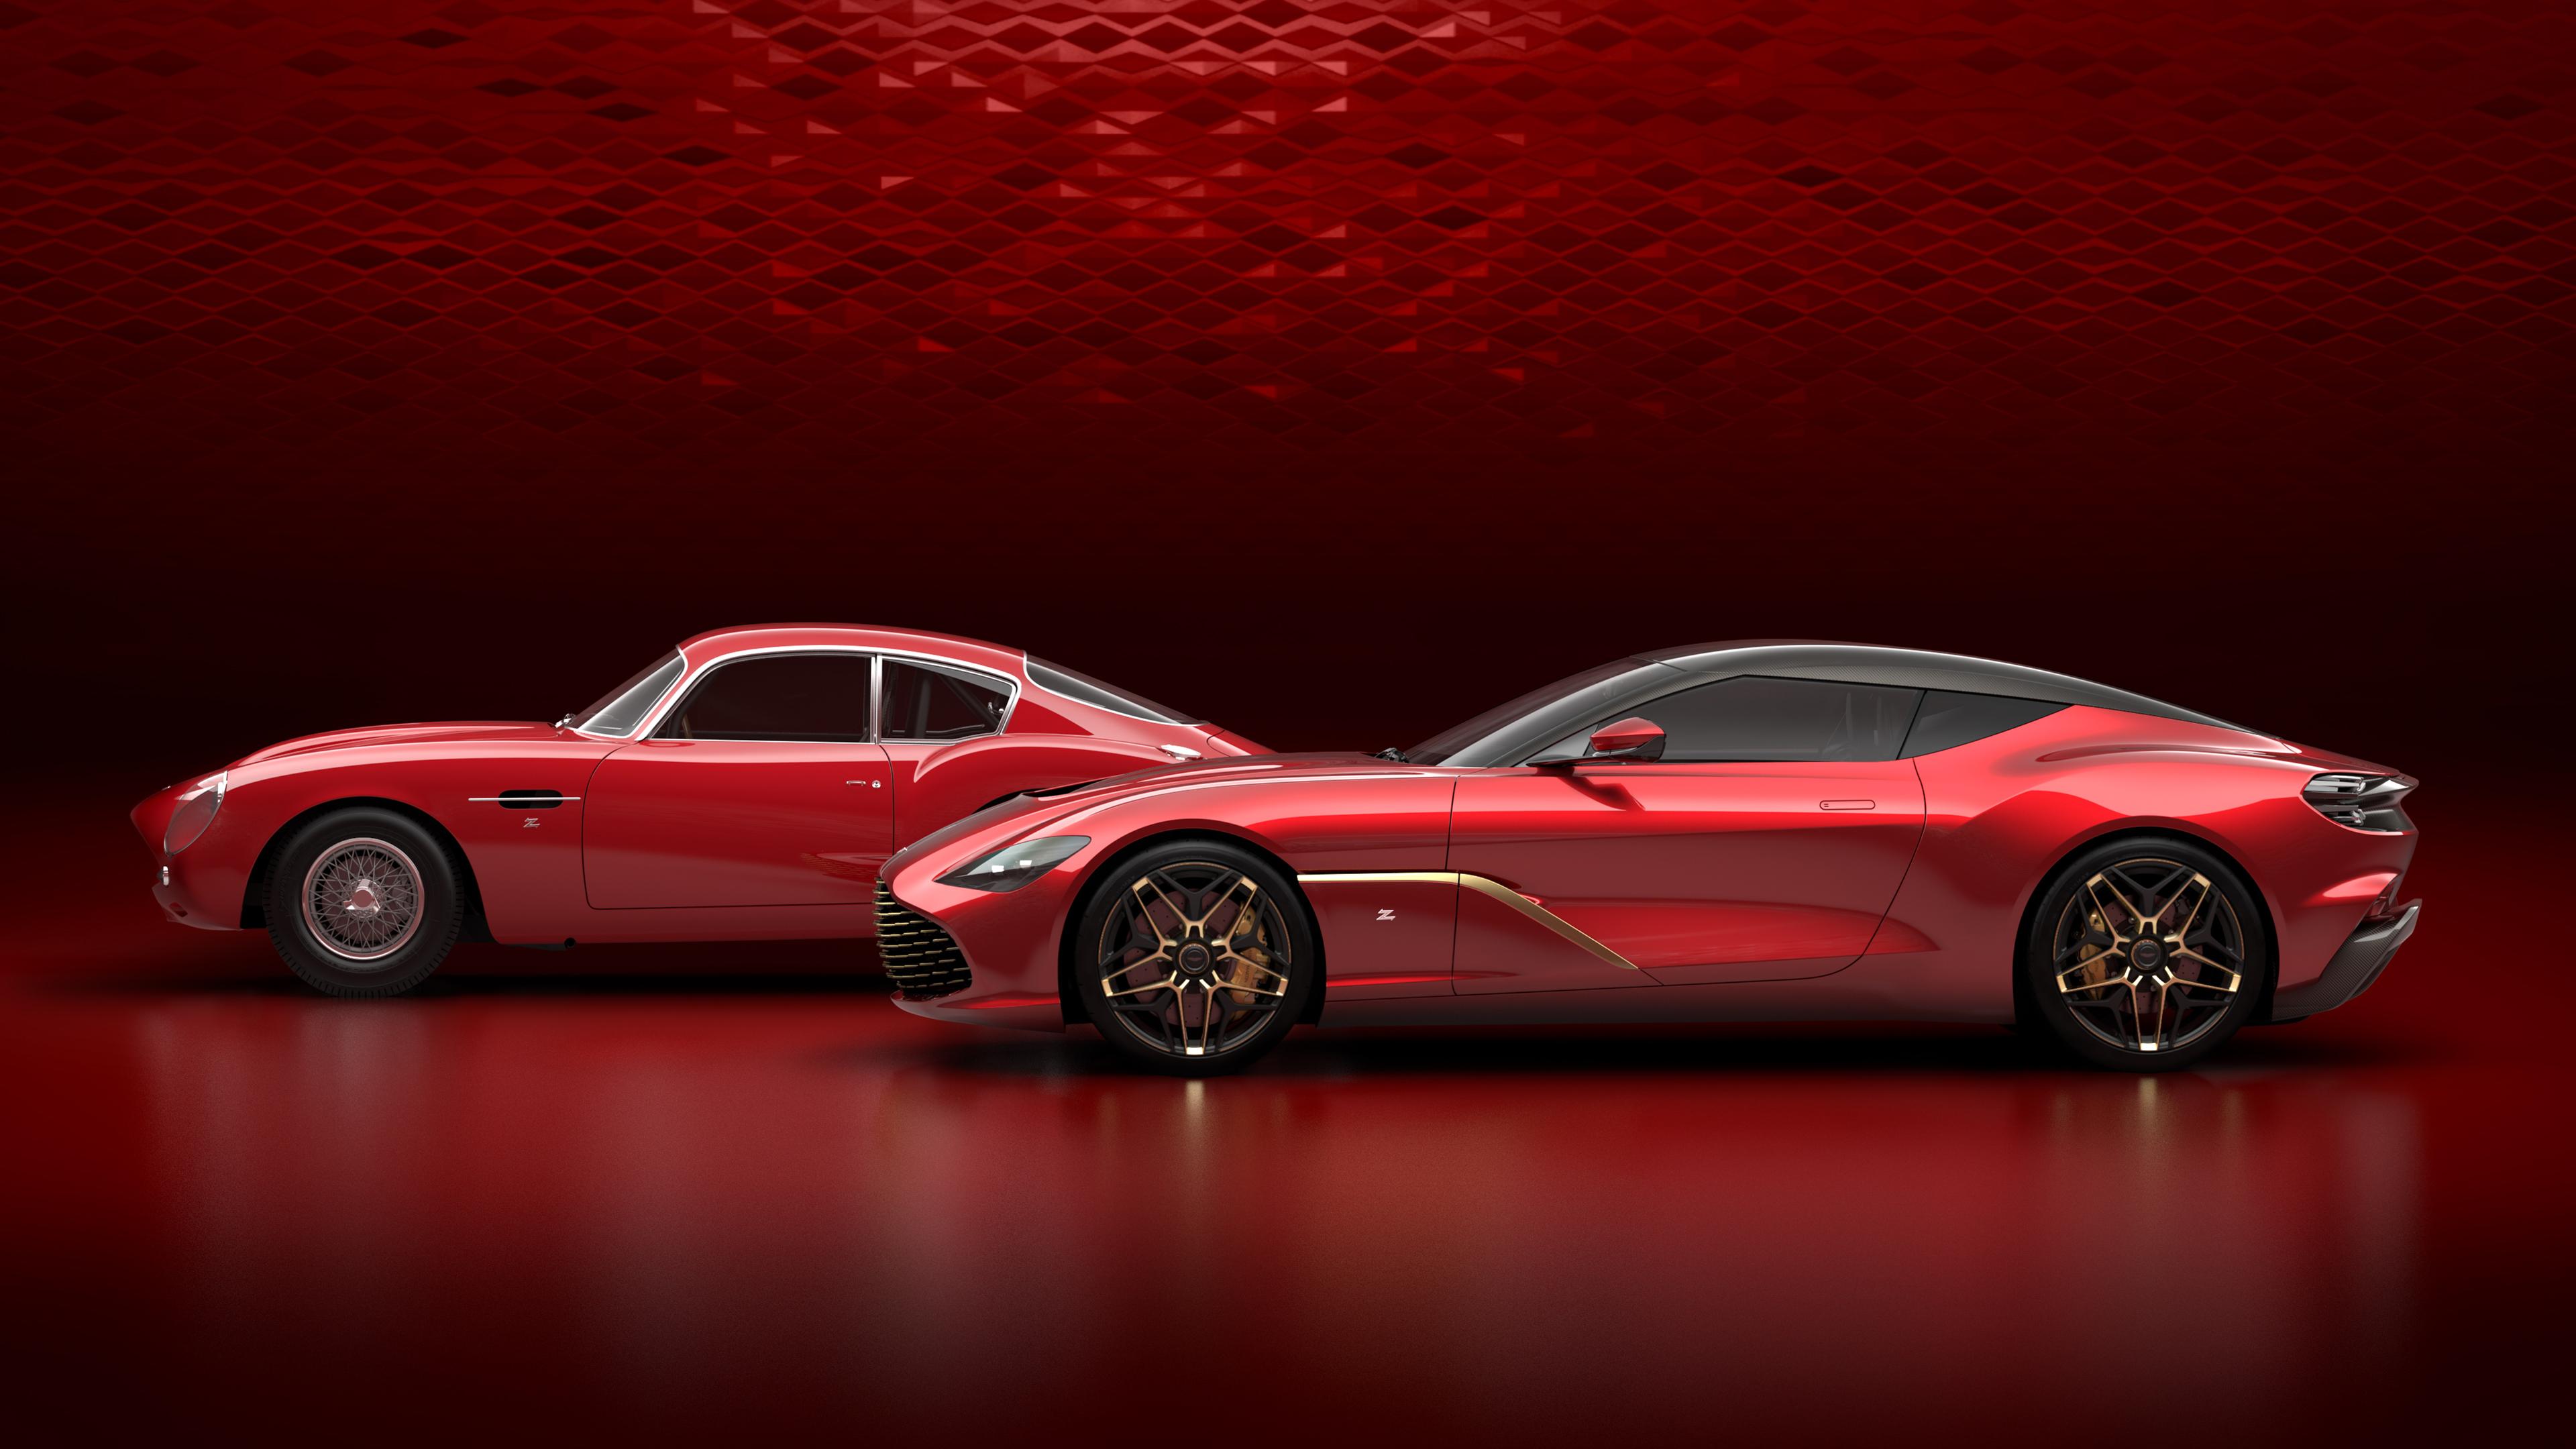 Aston Martin Dbs Gt Zagato 2019 4k 3 Wallpaper Hd Car Wallpapers Id 12900